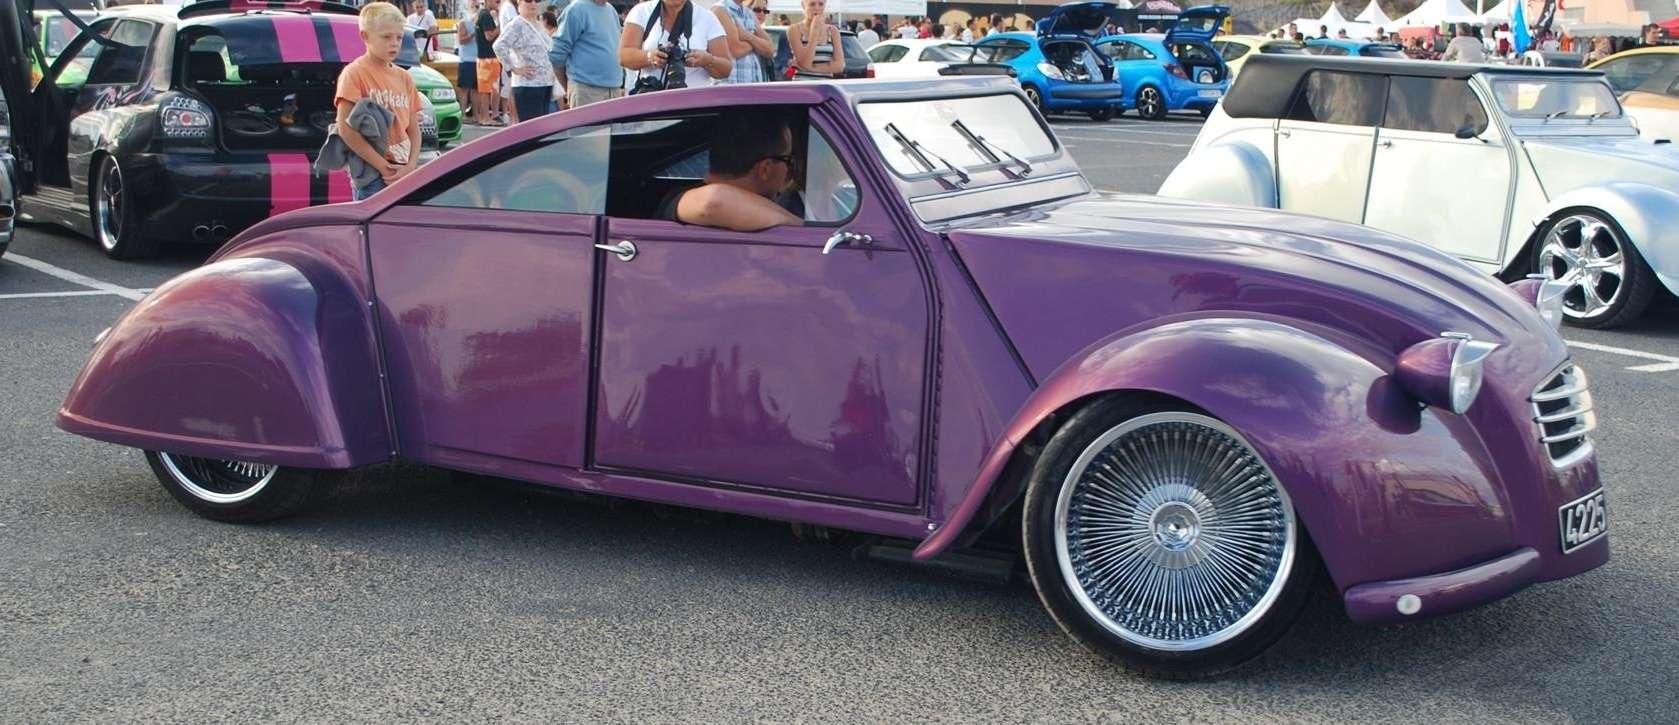 Steve White Vw >> Citroën CV 2 Hotrod | Only cars and cars